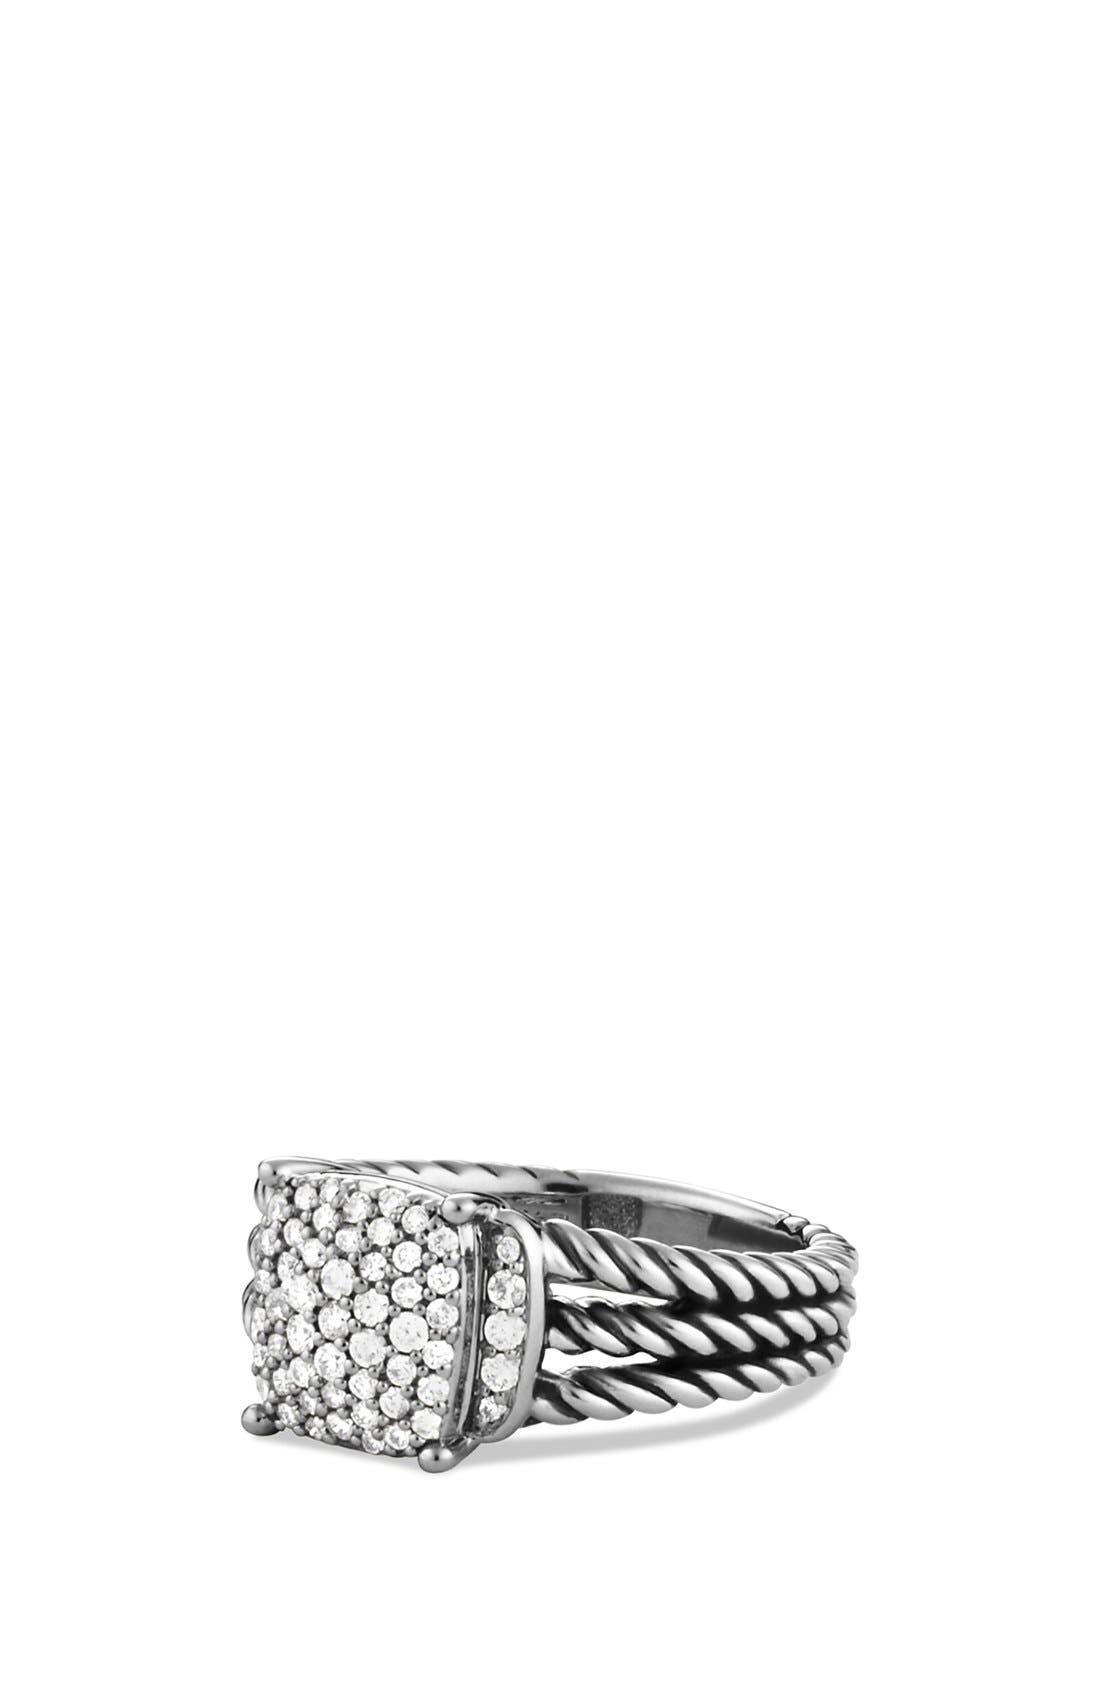 'Wheaton' Petite Ring with Diamonds,                             Main thumbnail 1, color,                             Diamond